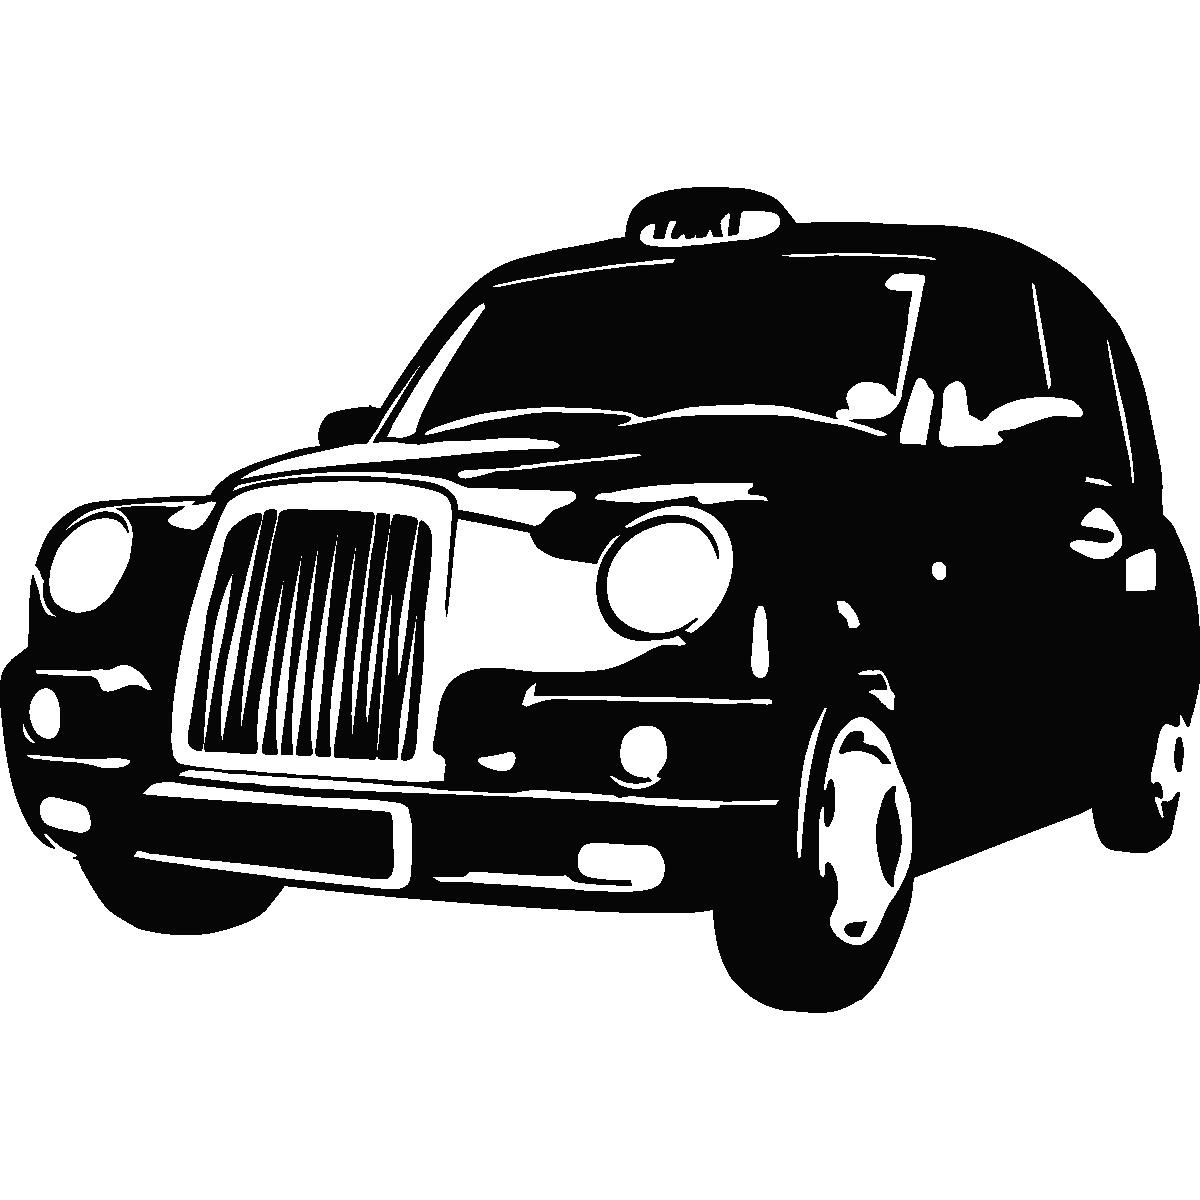 free taxi cliparts download free clip art free clip art. Black Bedroom Furniture Sets. Home Design Ideas